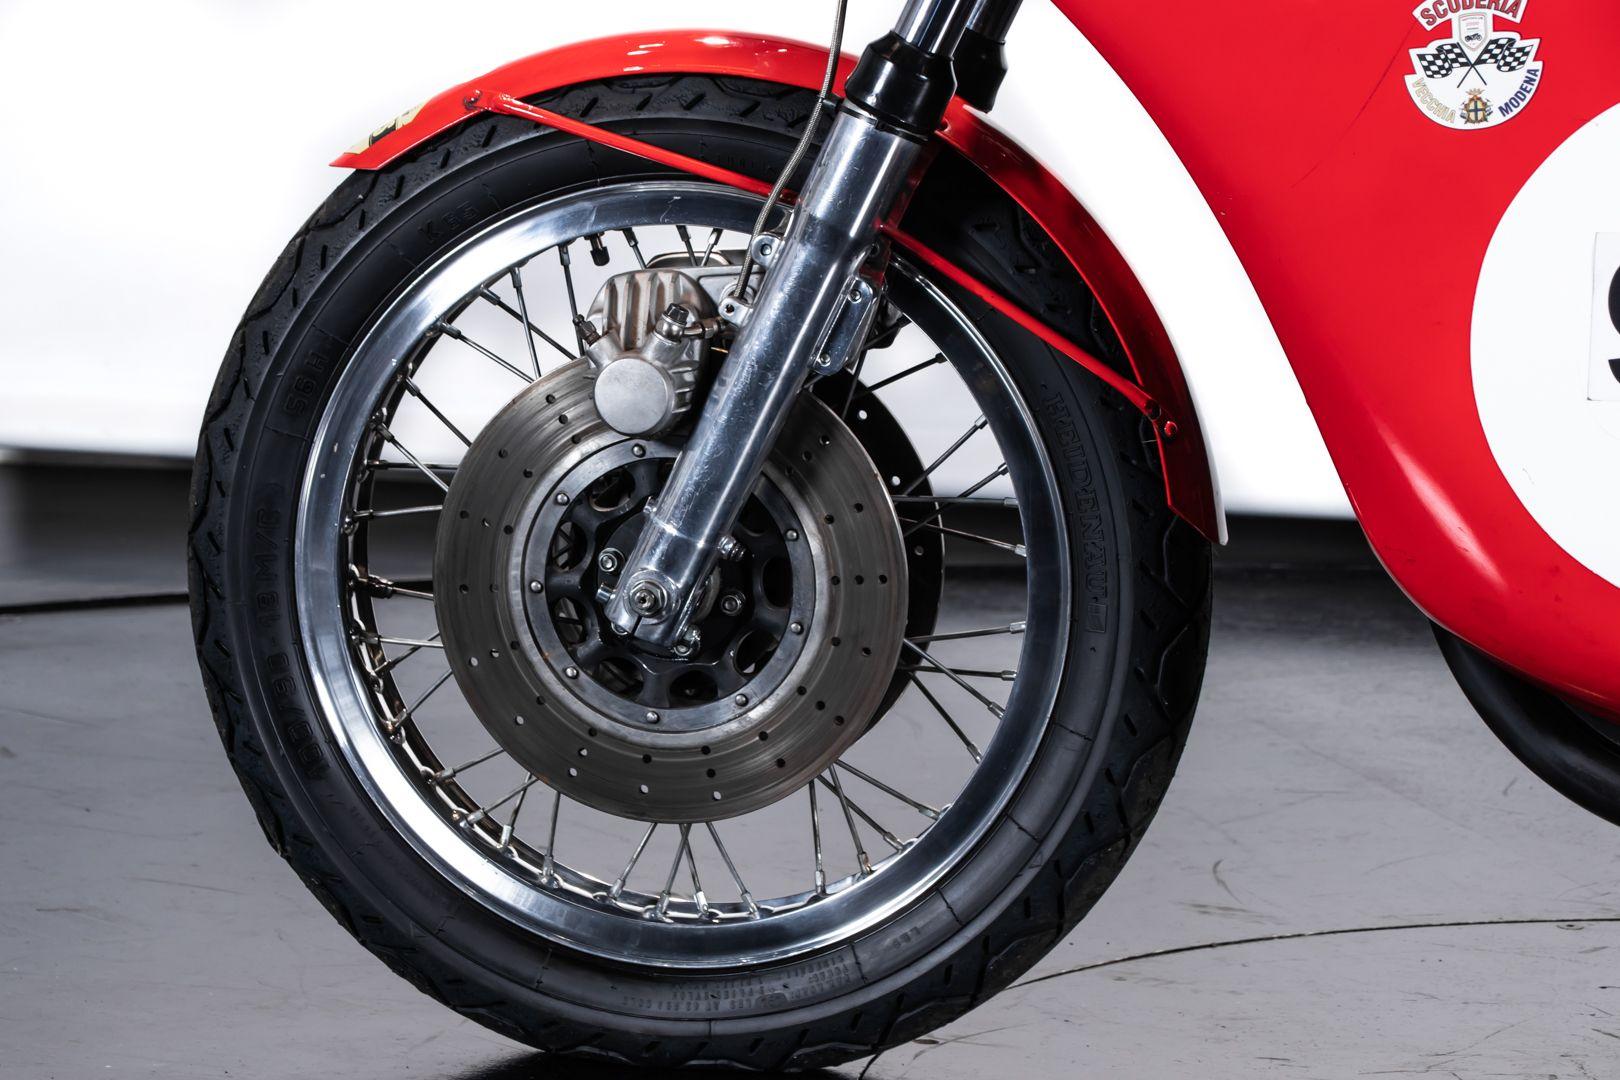 1973 Honda 750 Daytona Replica 72309